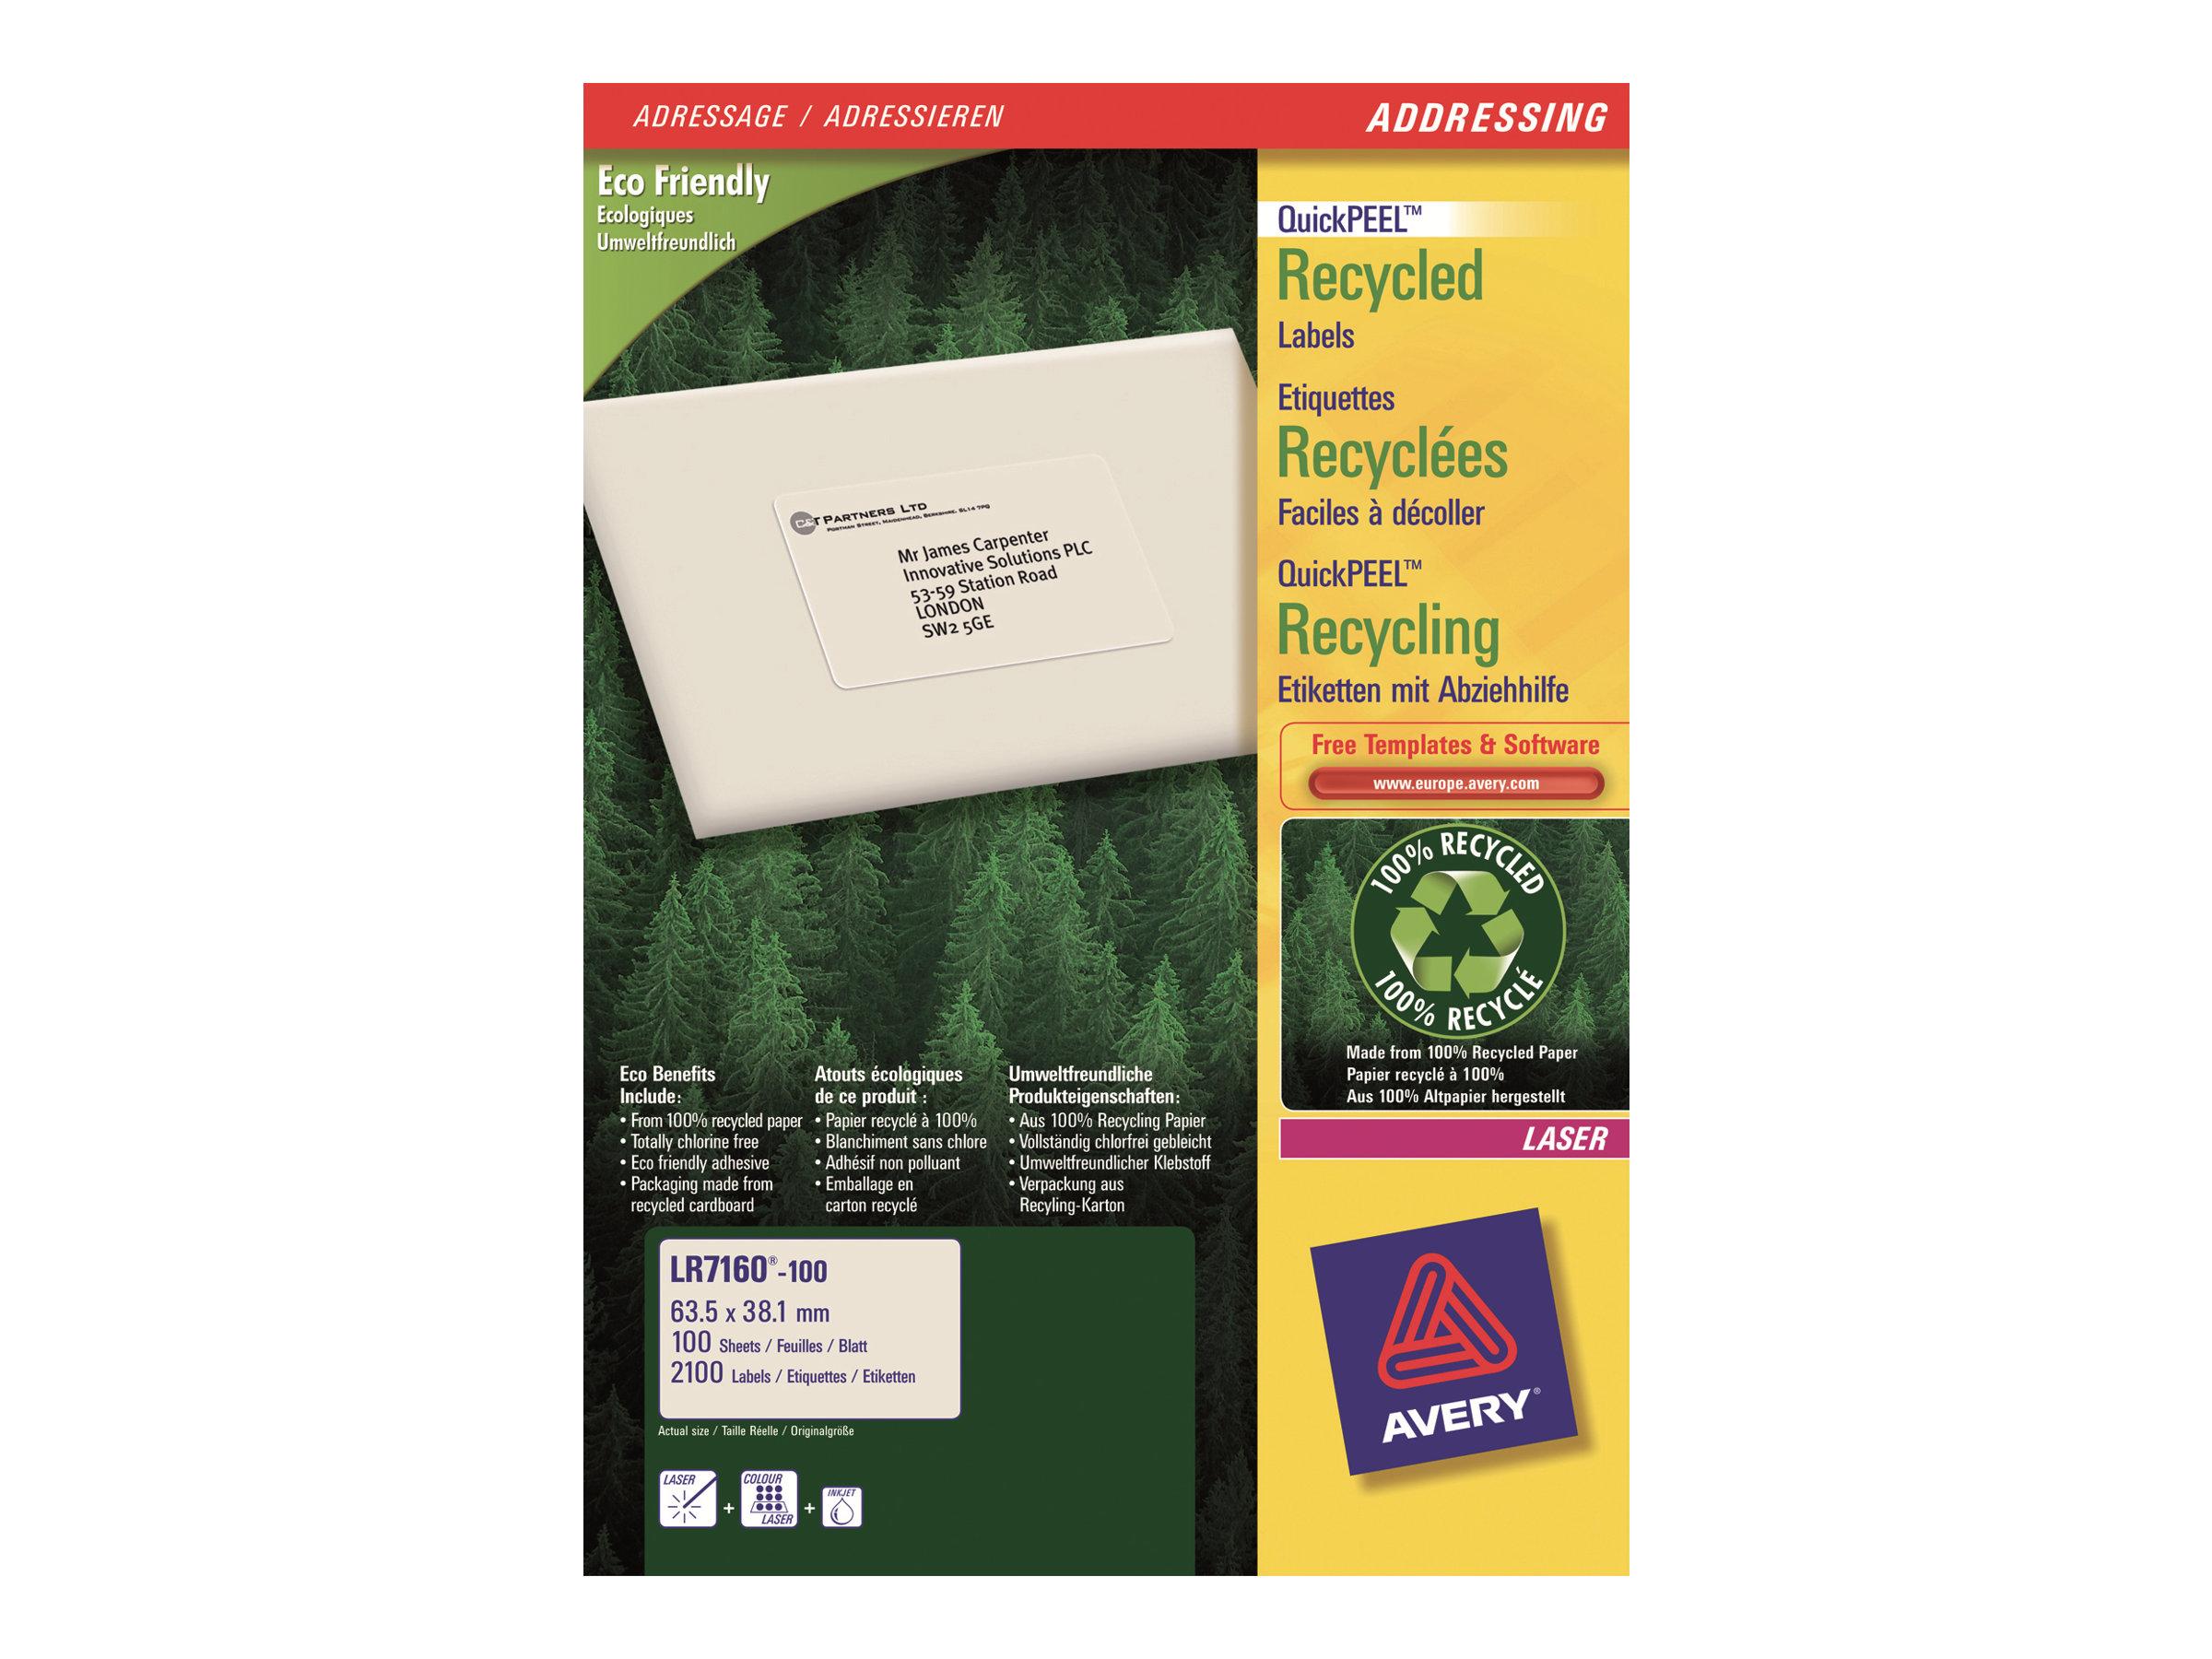 Avery - 2100 Étiquettes adresse recyclées blanches - 38,1 x 63,5 mm - Impression laser - réf LR7160-100